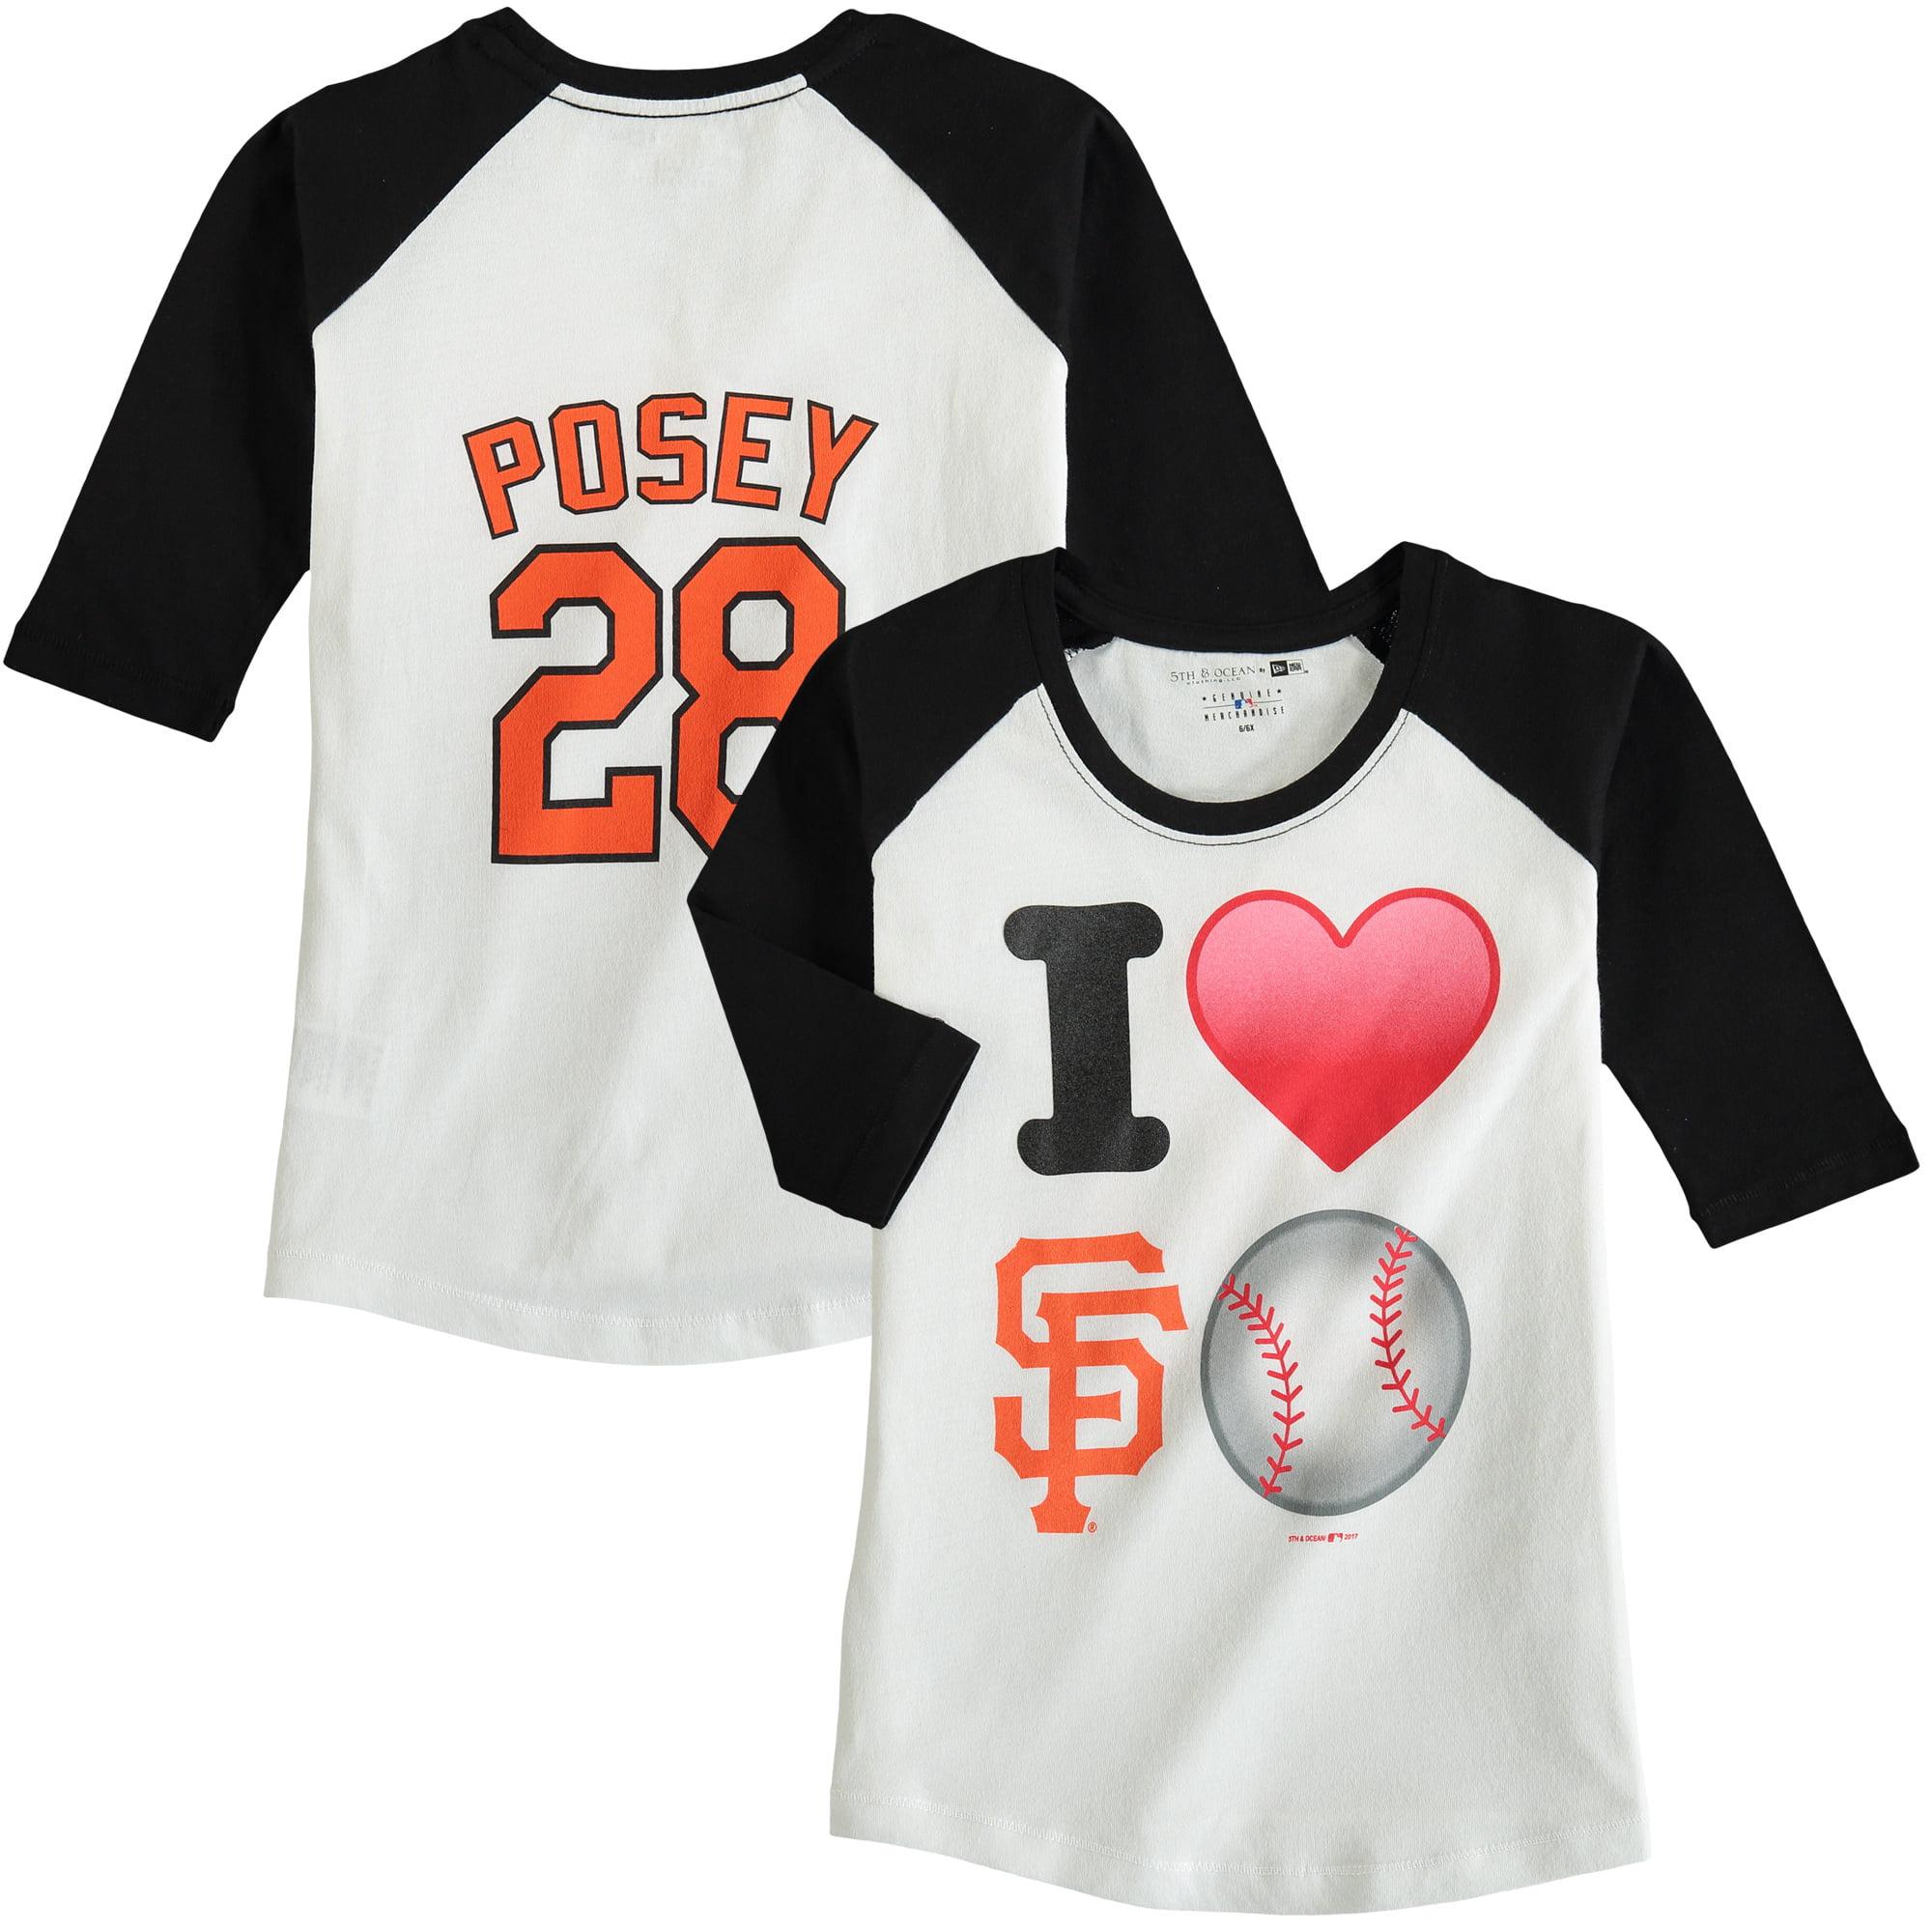 Buster Posey San Francisco Giants 5th & Ocean by New Era Girls Youth Emoji Love Player Name & Number 3/4-Sleeve Raglan T-Shirt - White/Black